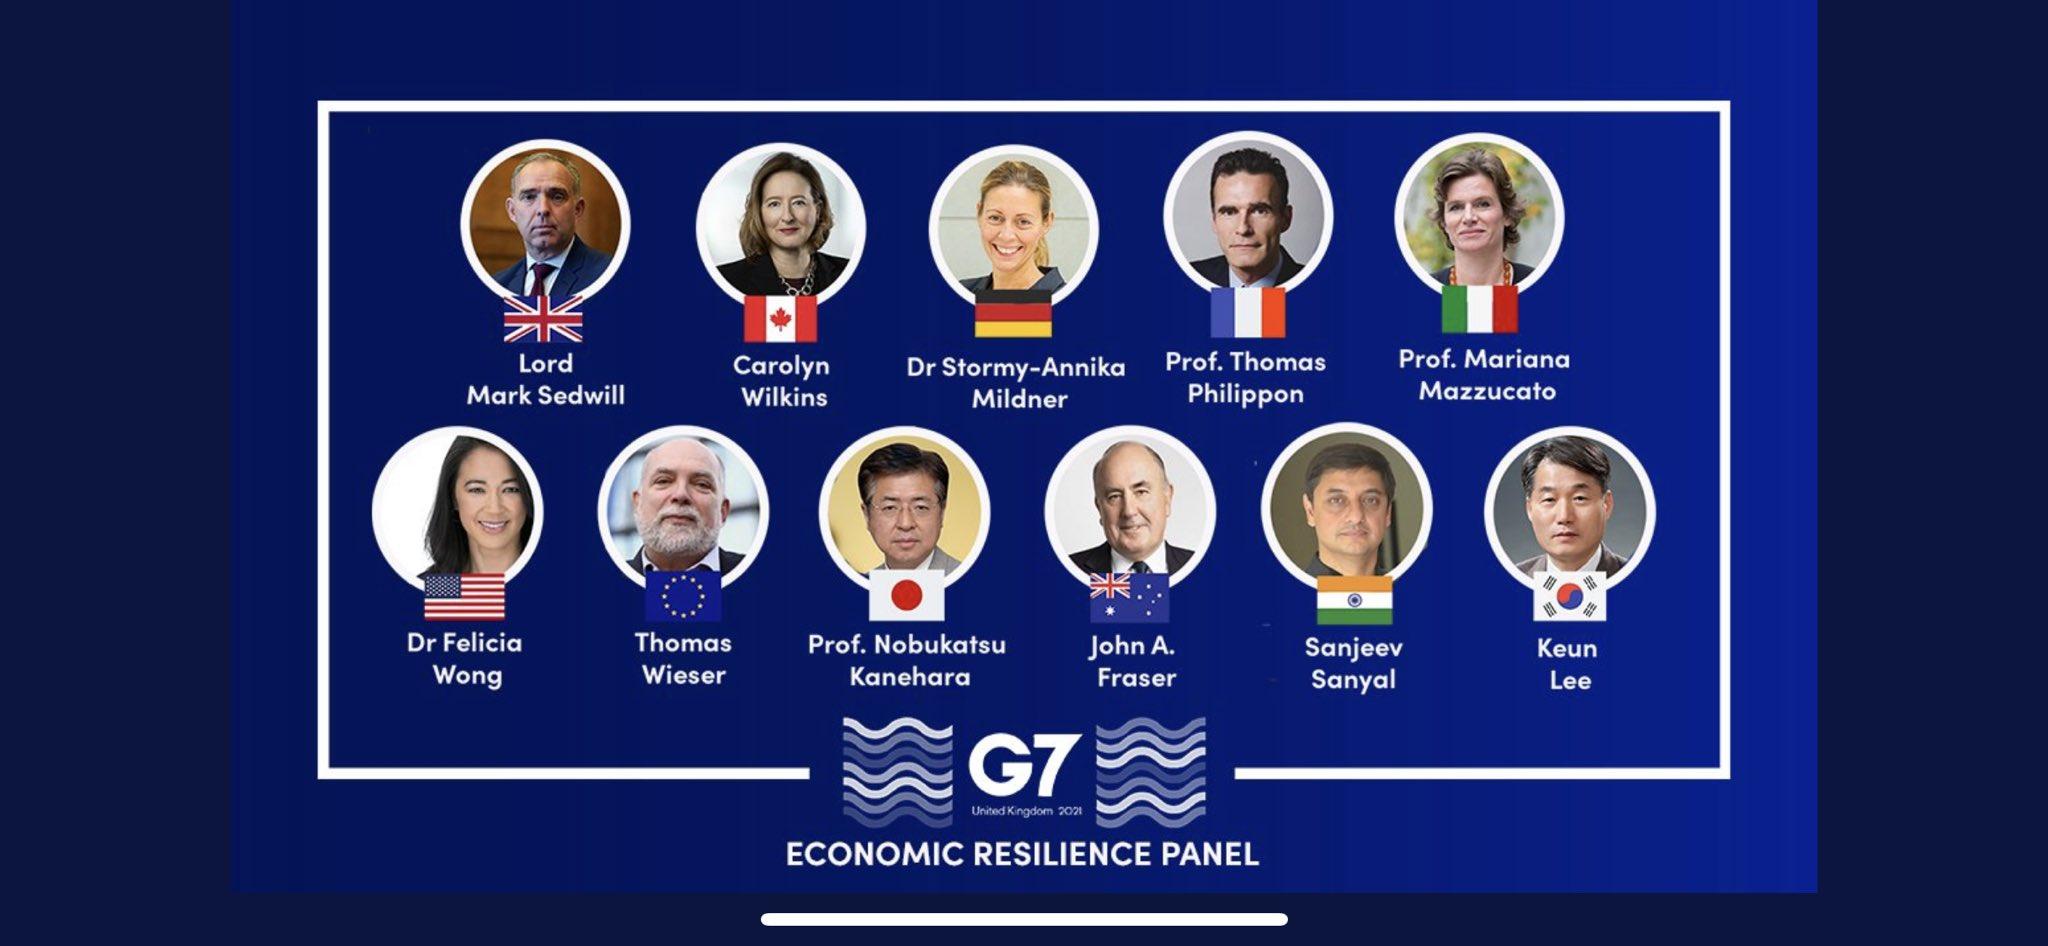 G7 Economic Resilience Panel 2021